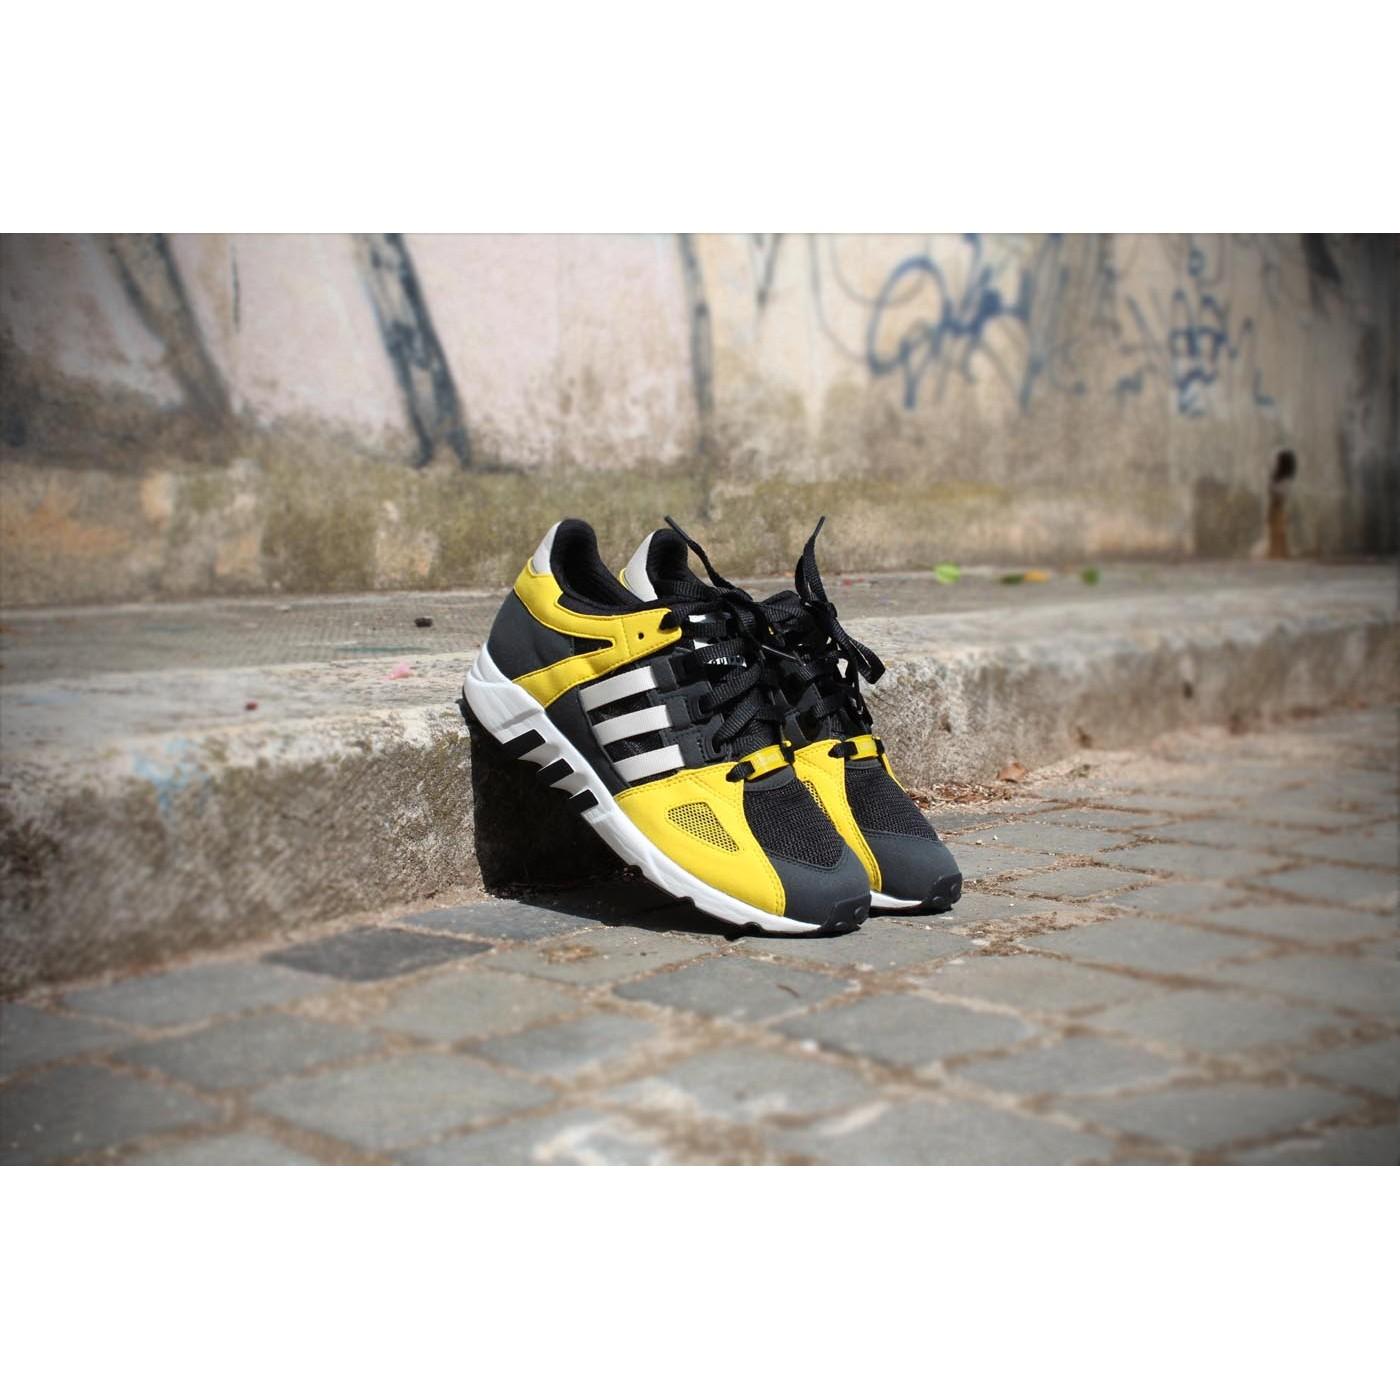 lowest price 37847 7acb8 adidas-equipment-guidance-93-m25499-blackwhiteyellow